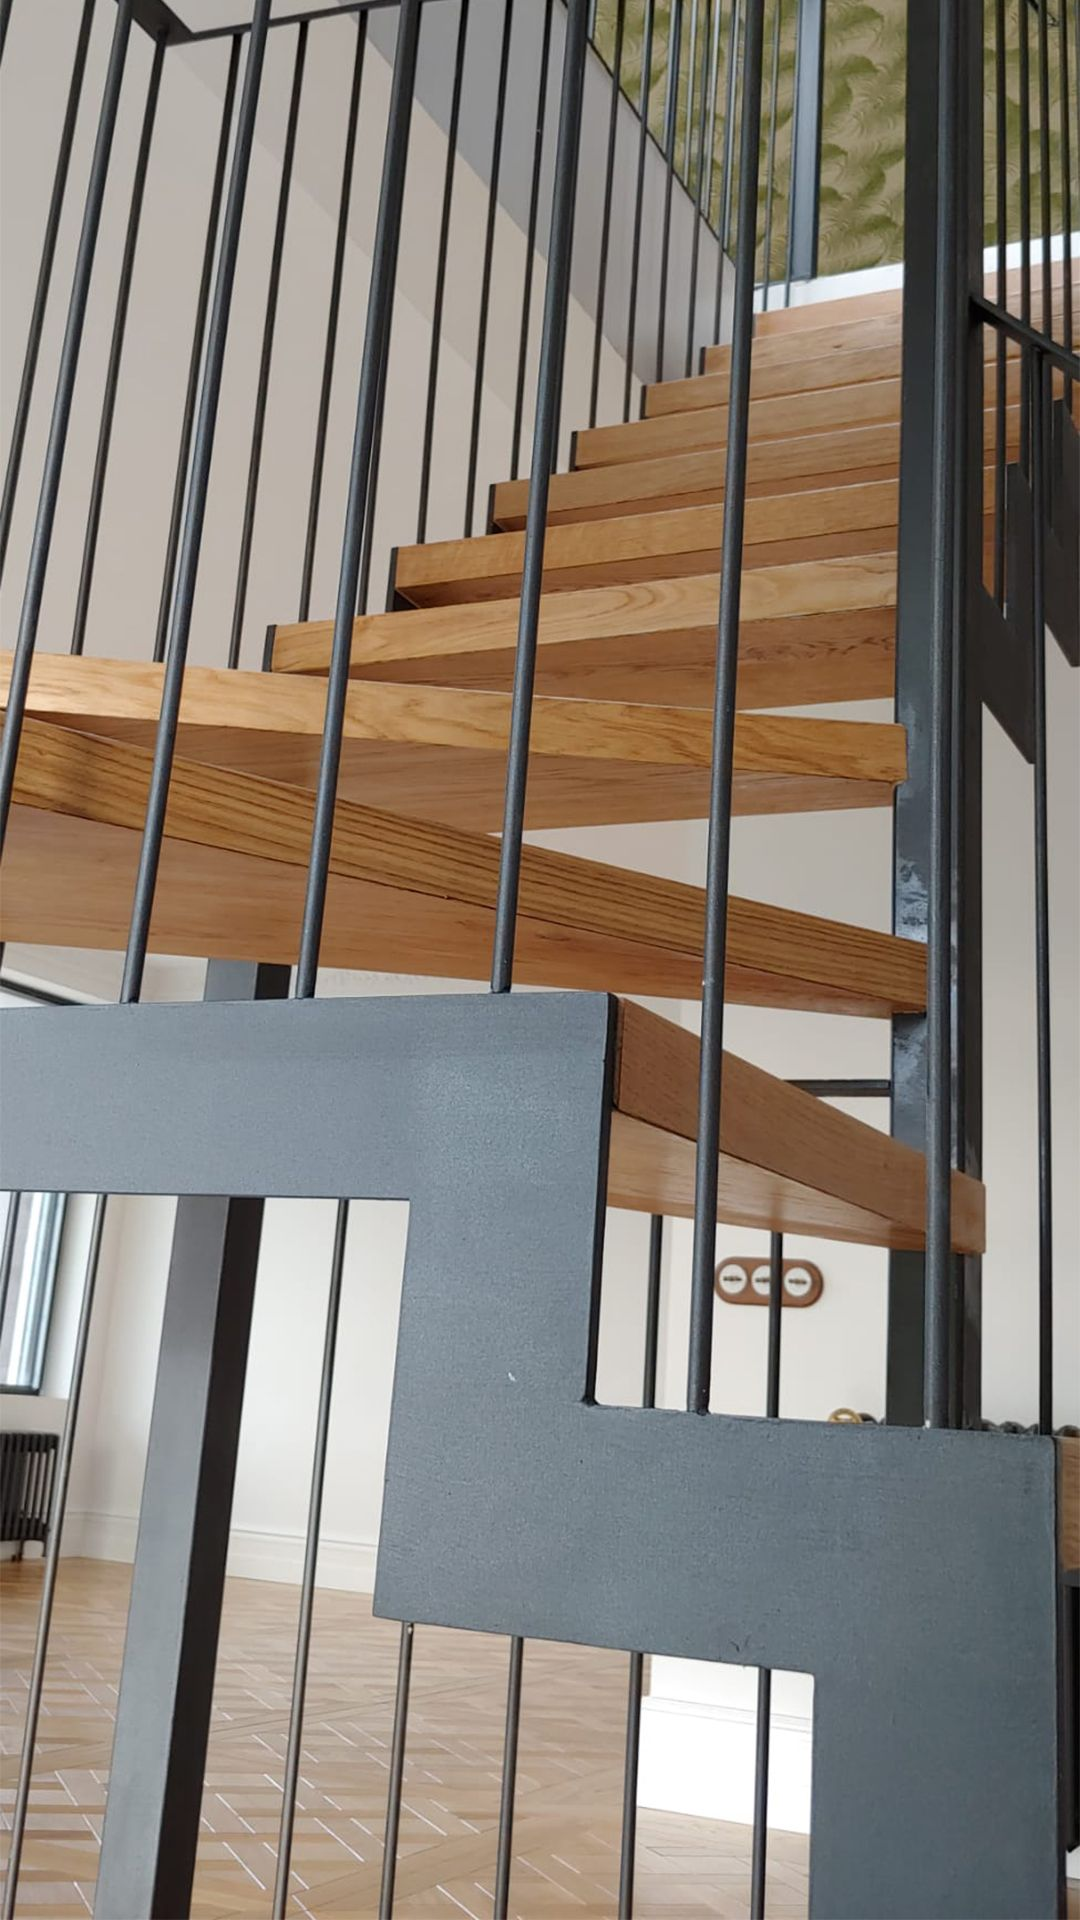 Escalera con peldaño en madera de roble natural